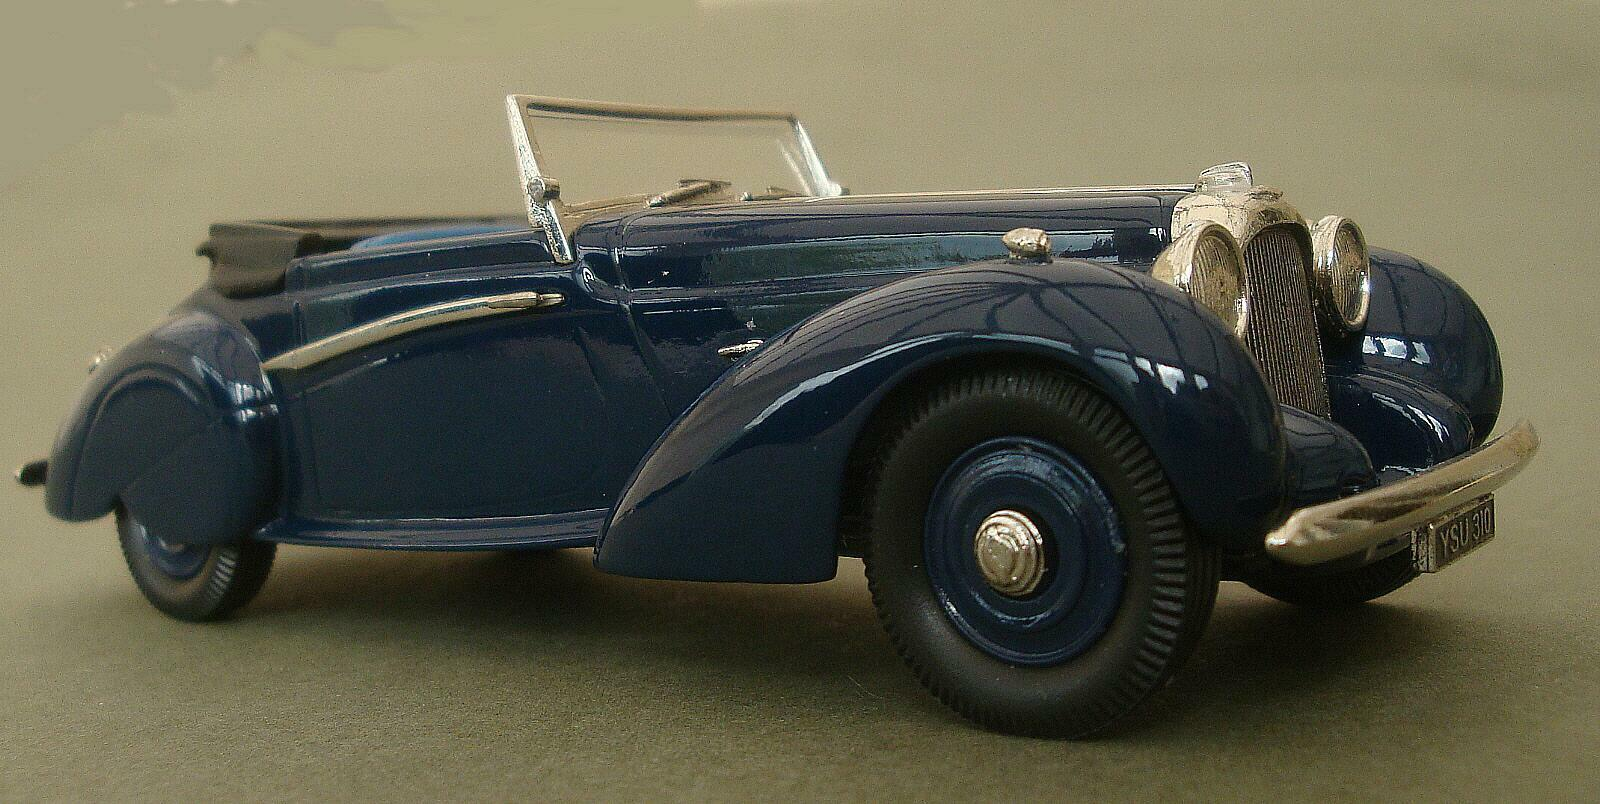 1939 lagonda v12 vantage lansdowne modelle fallen é kopf.